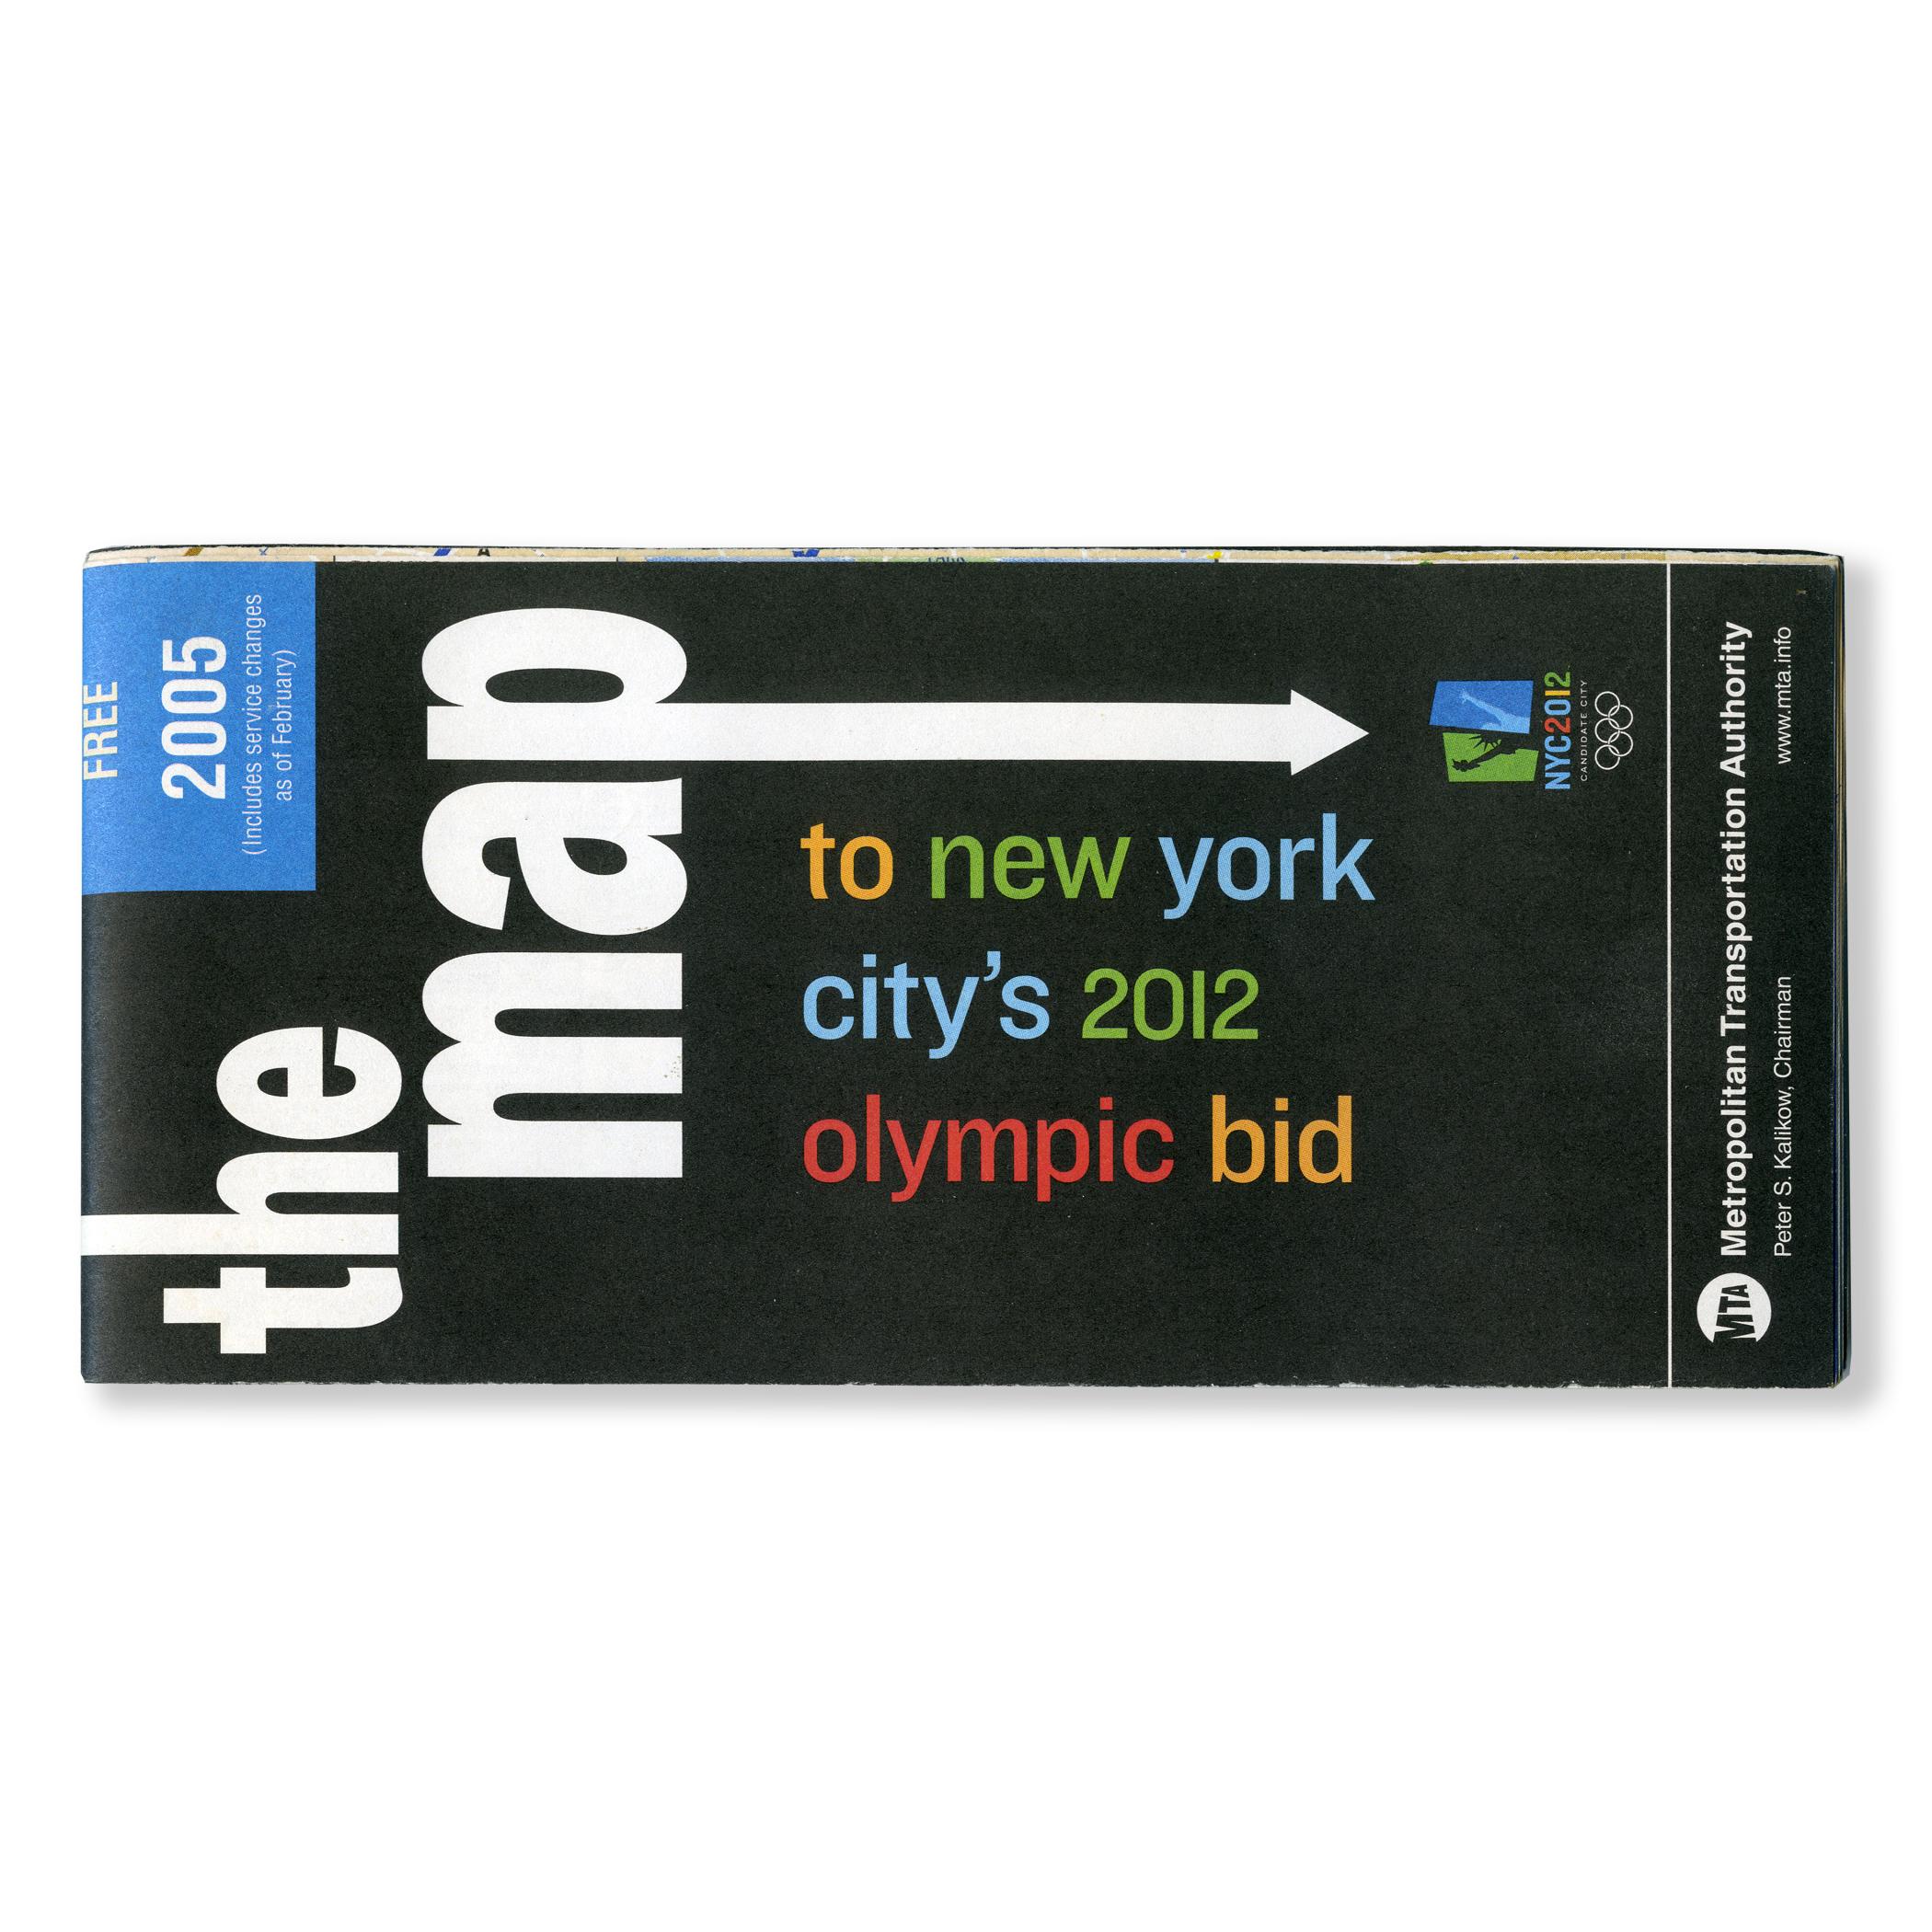 the_nycta_project_2005_olympic_bid_mta_map.jpg